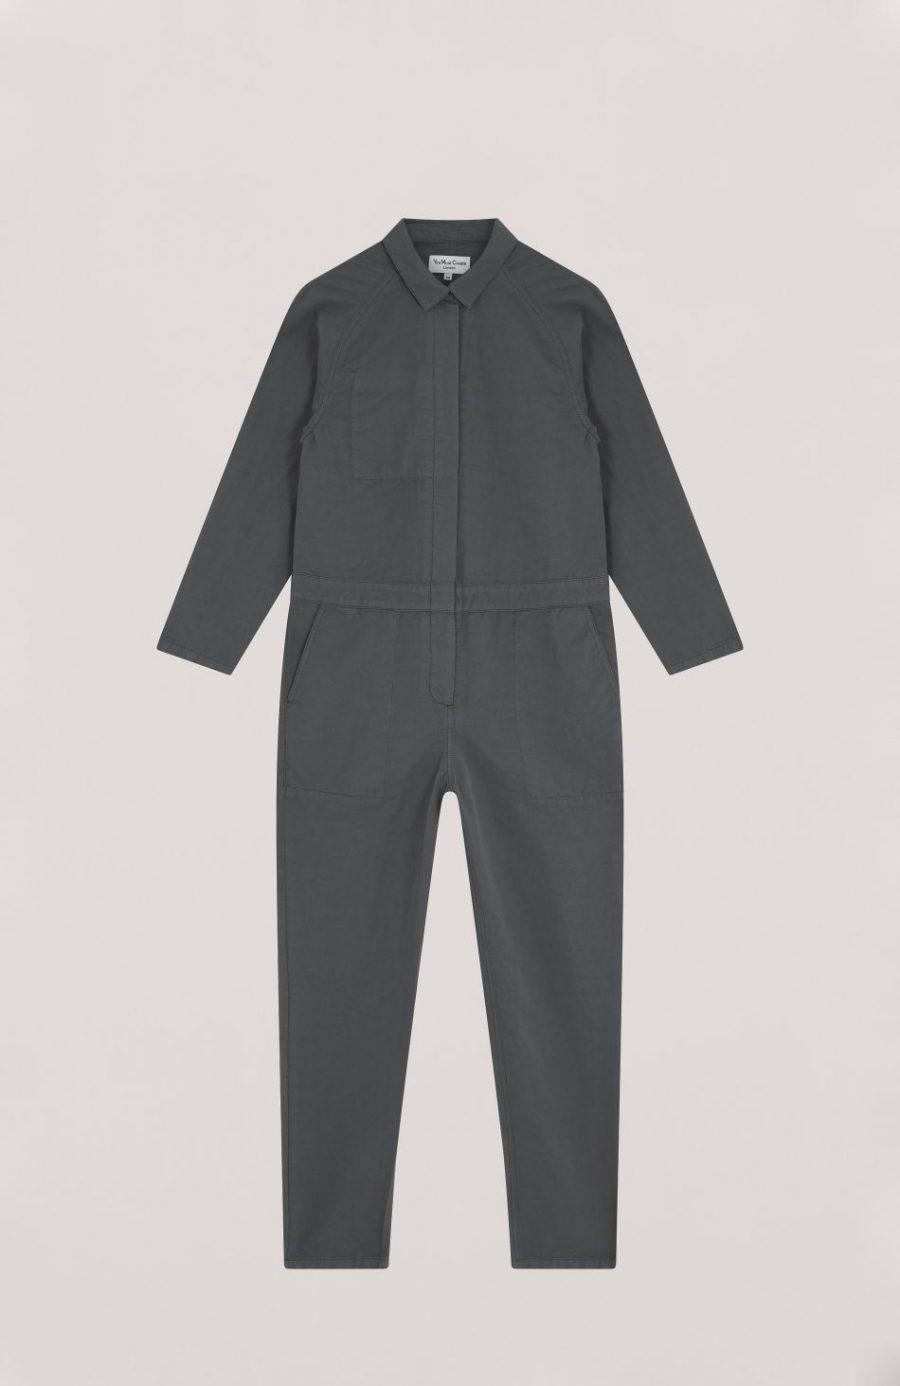 QGNAA-Garland-Jumpsuit-Slate-950×1463